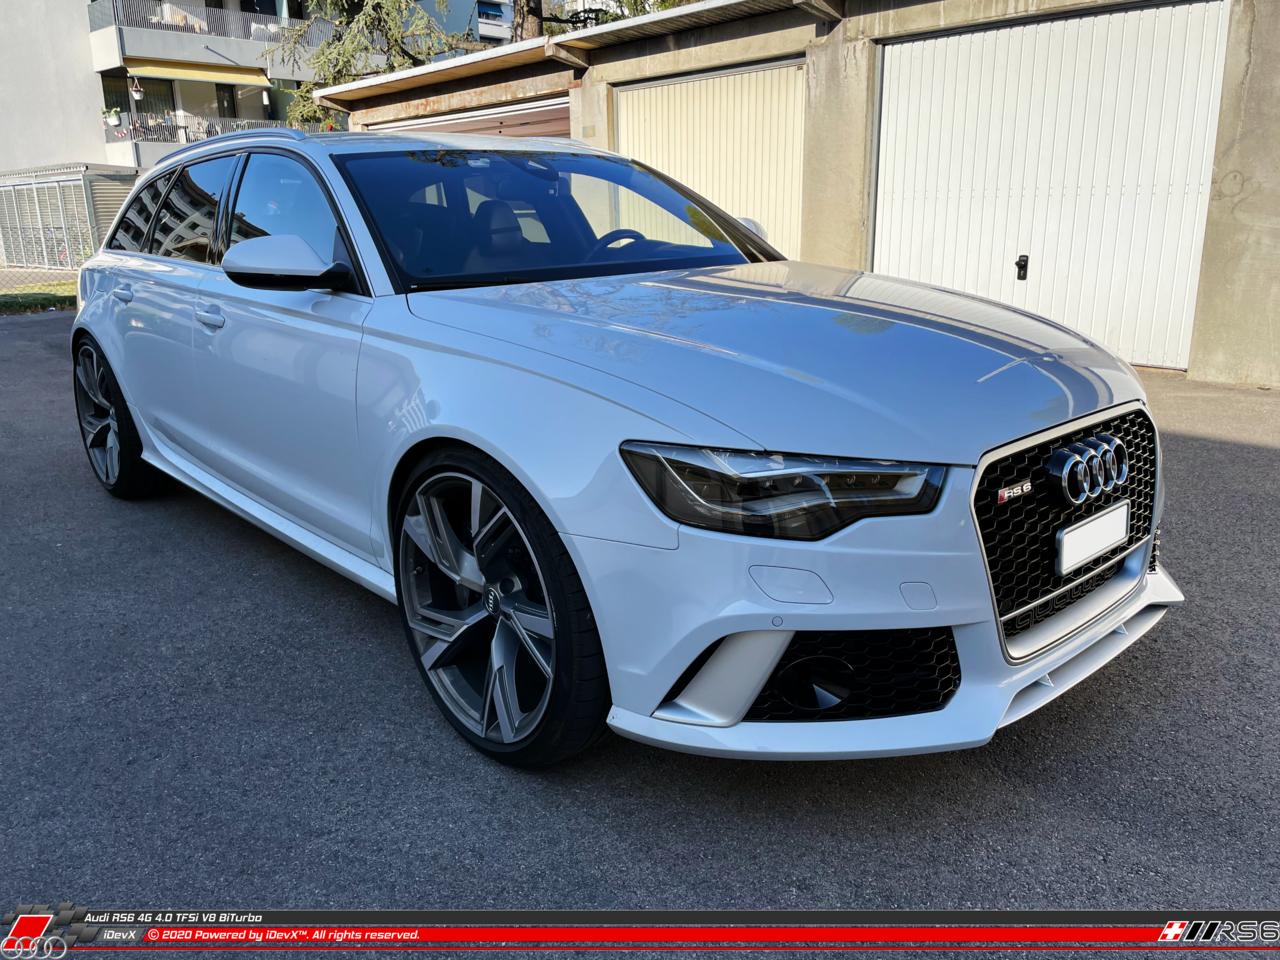 23.04.2021_Audi-RS6_iDevX_001.png